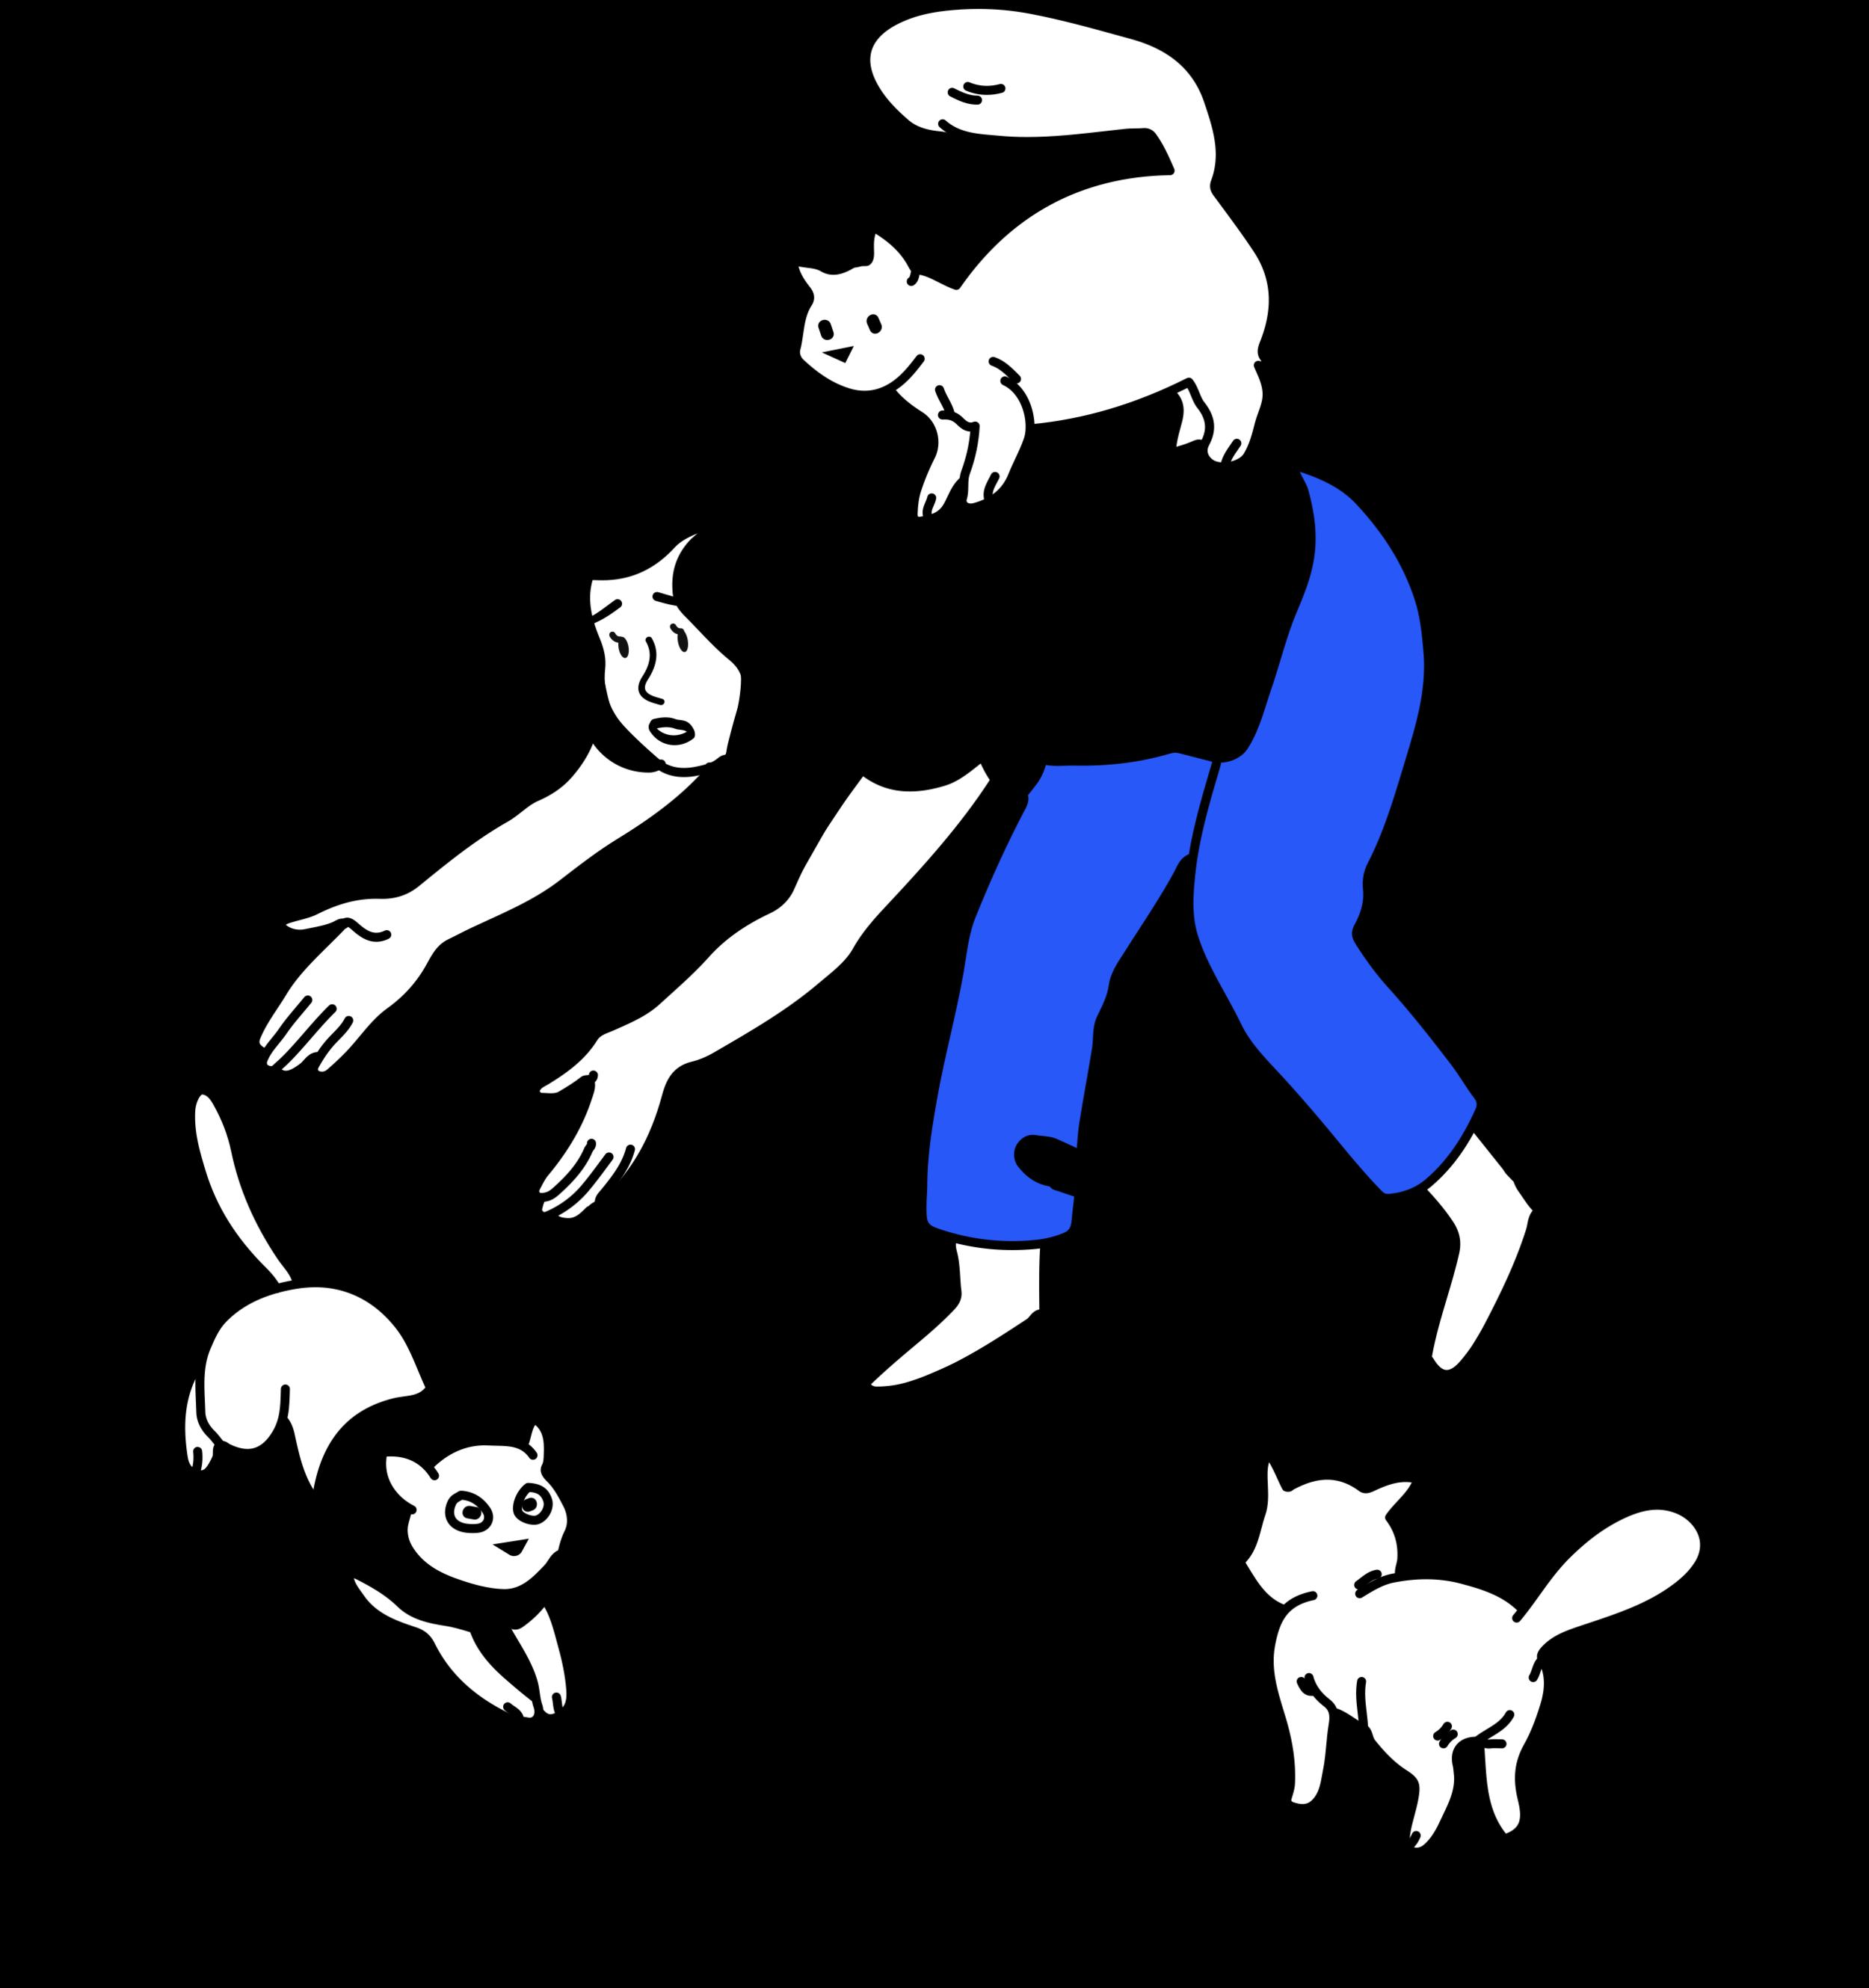 ScaleSpark_Illustrations_HerdingCats.png